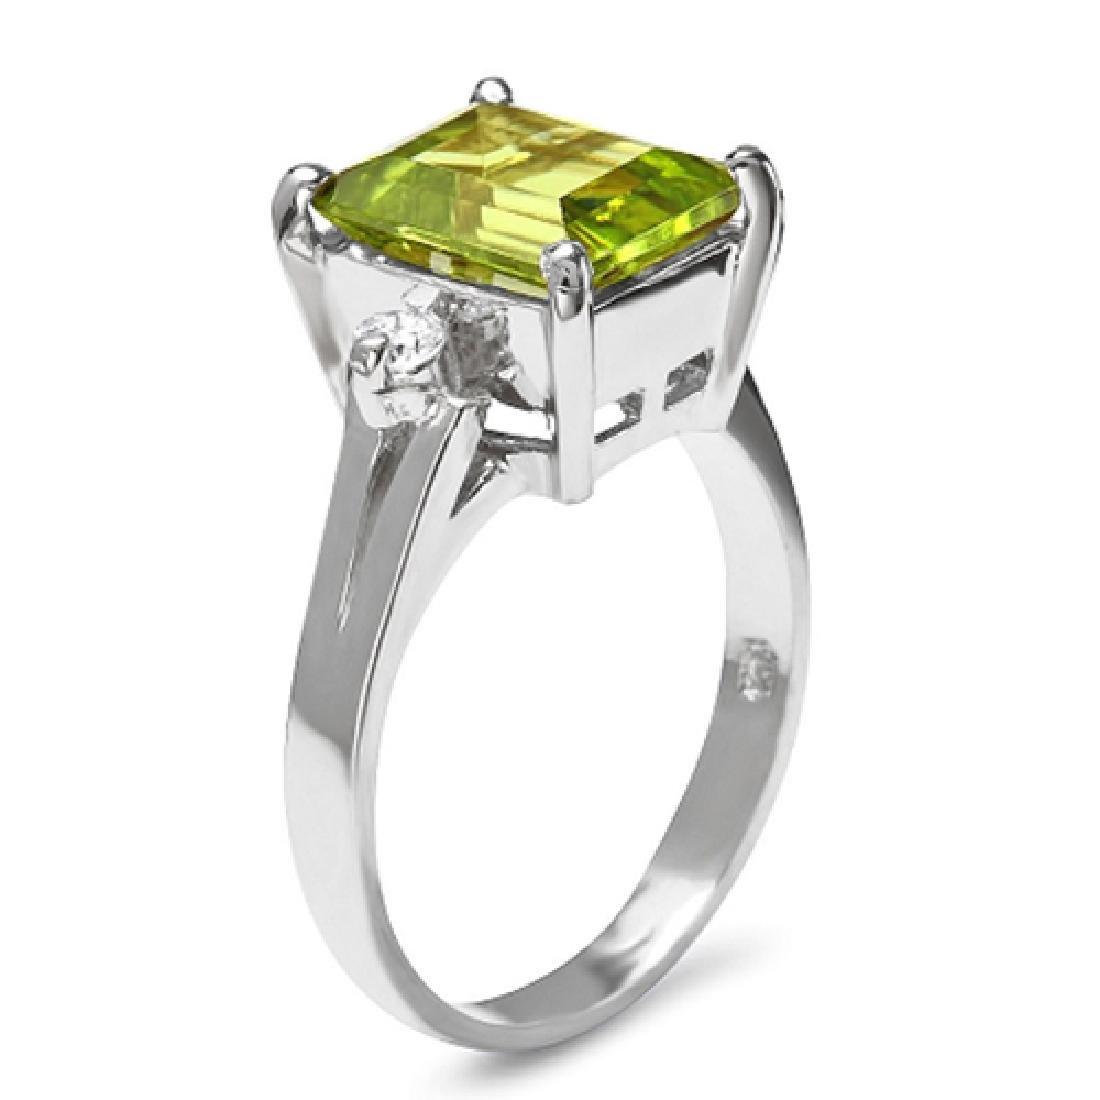 2.60 Carat Natural Peridot 18K Solid White Gold Diamond - 2